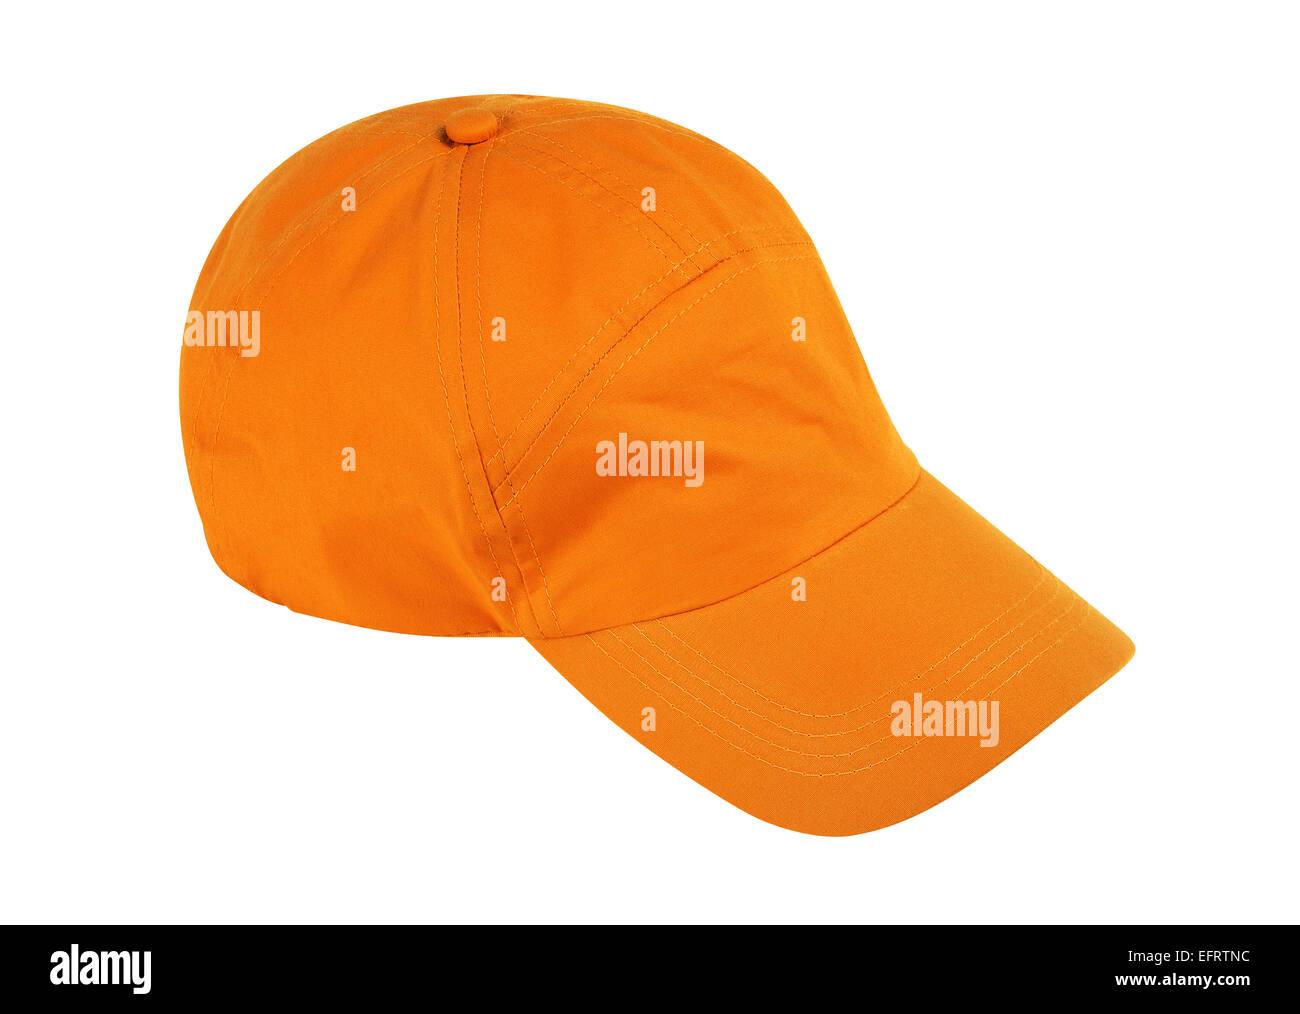 Gorra de béisbol aislado sobre fondo blanco w/ trazado de recorte Foto de stock